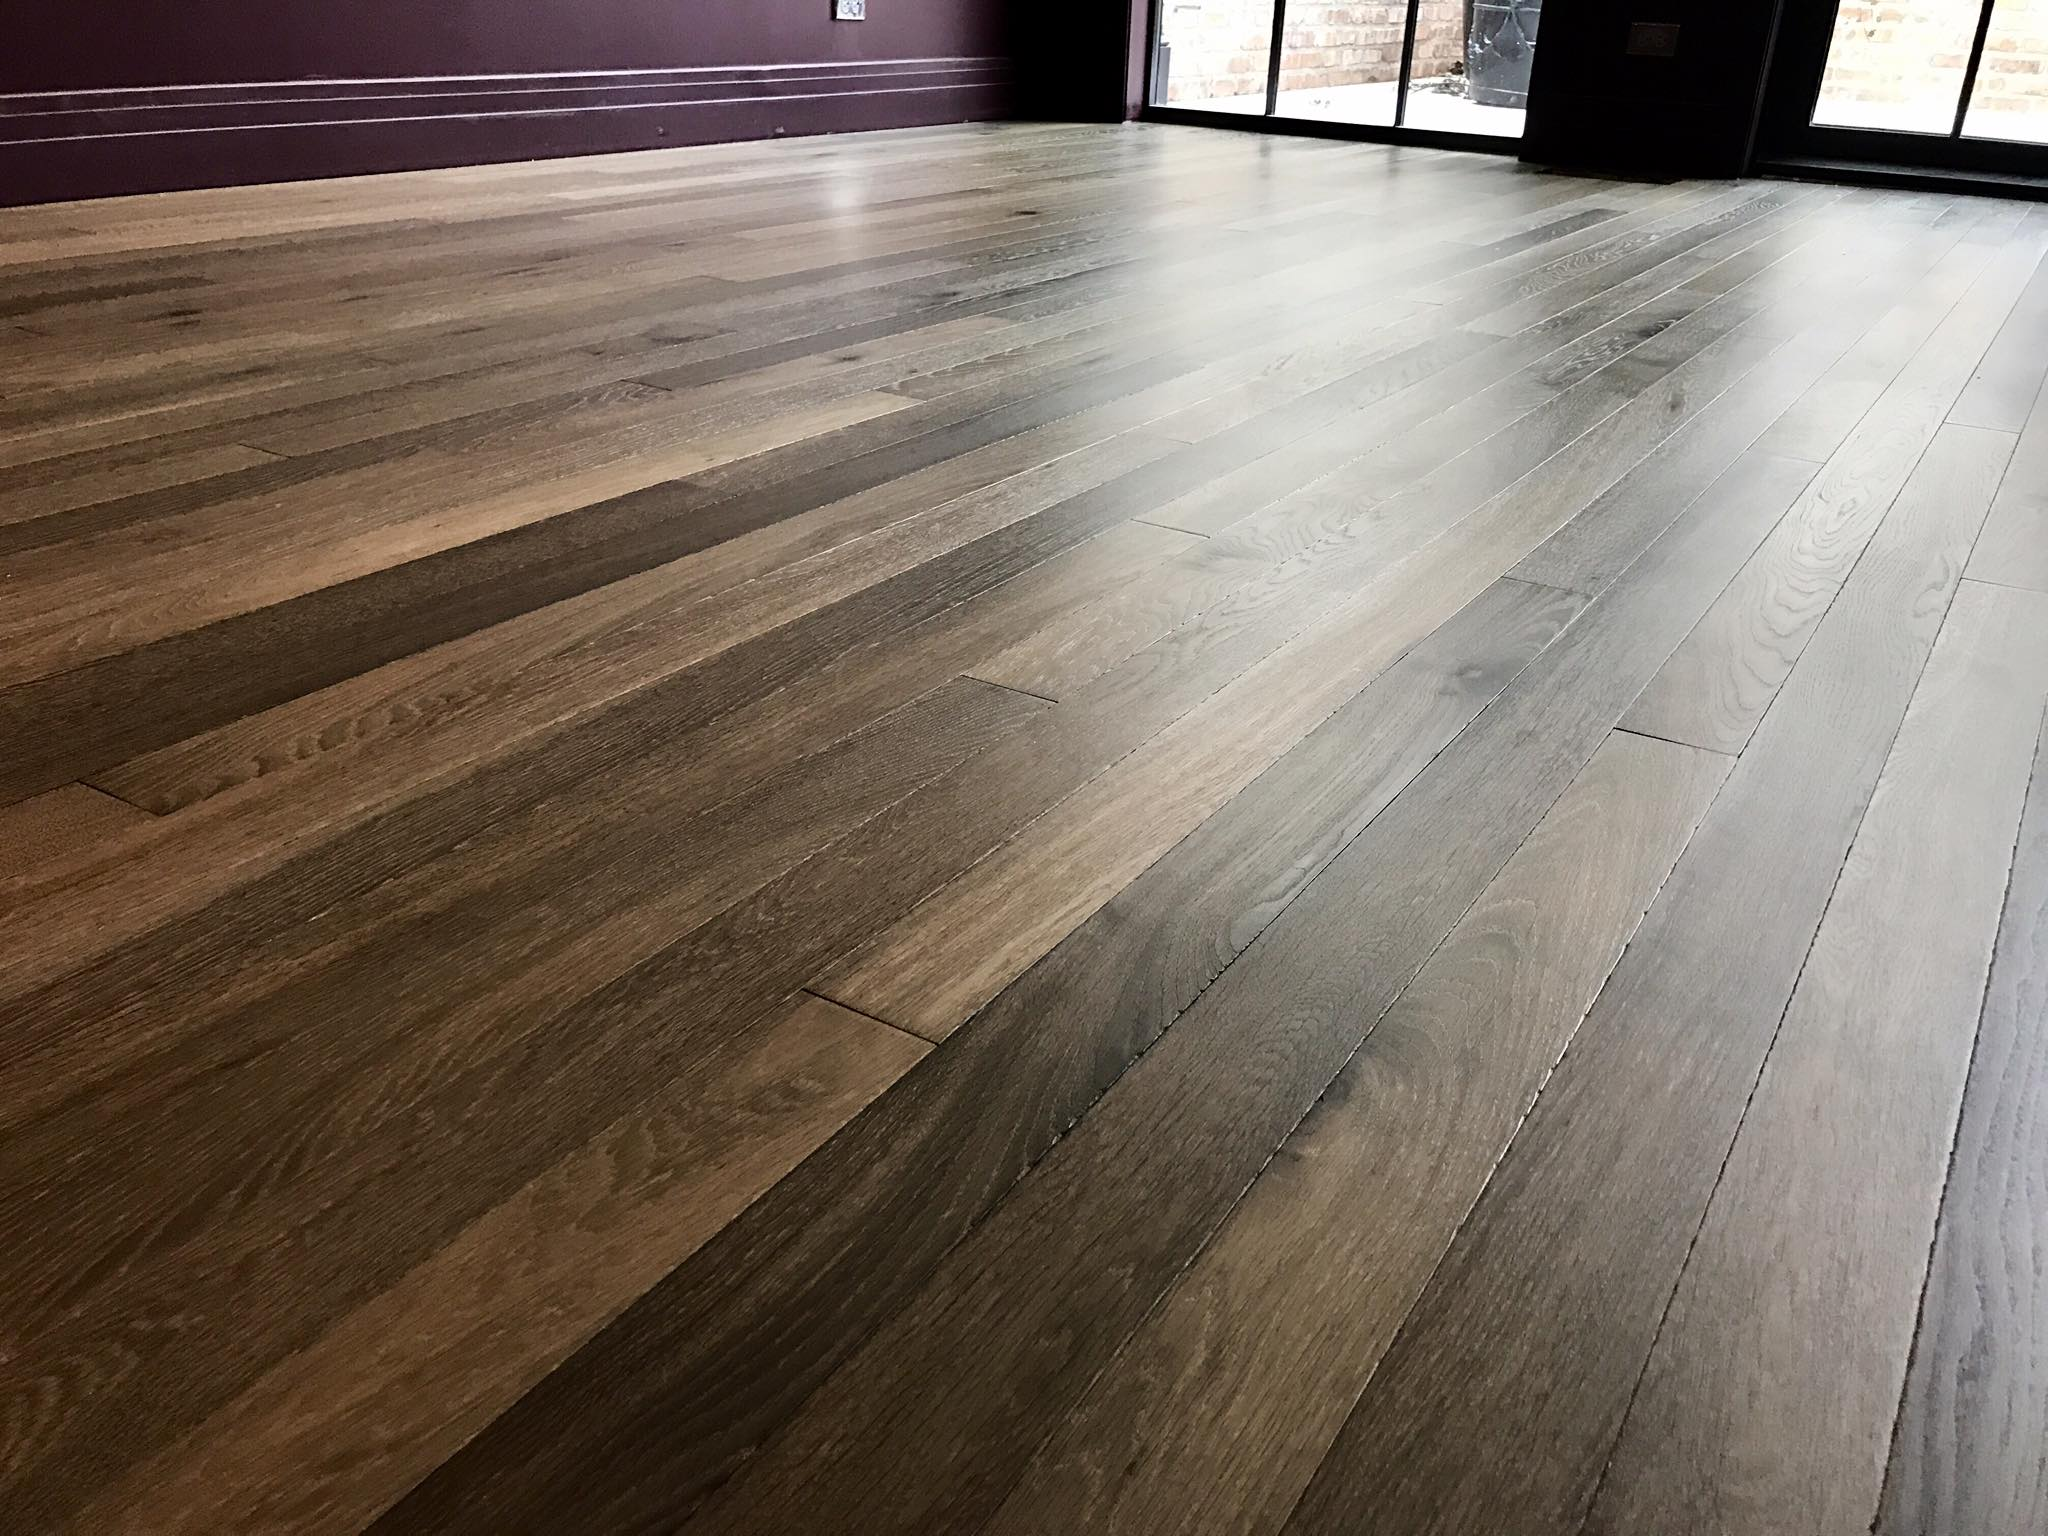 Herringbone French Oak Hardwood Floor Installation in ...